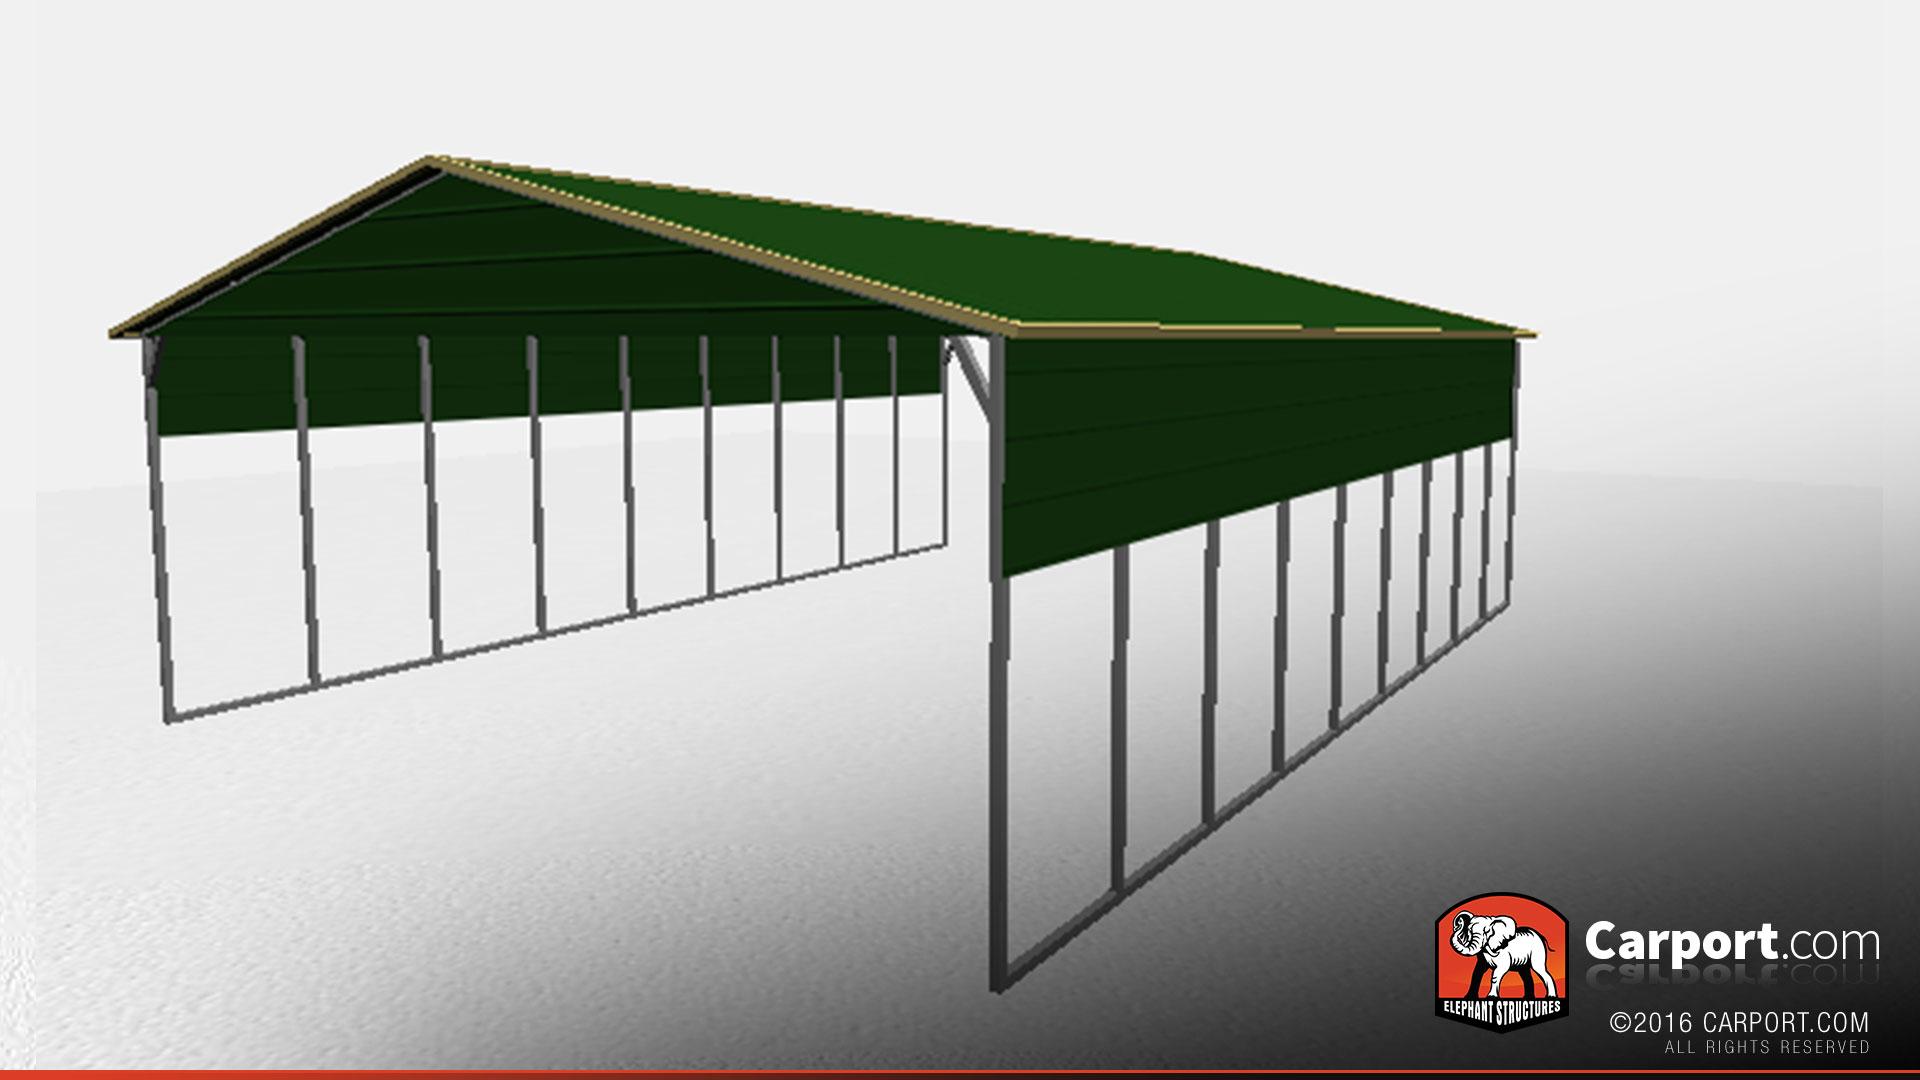 26' x 36' Vertical Style Commercial Metal Carport ...